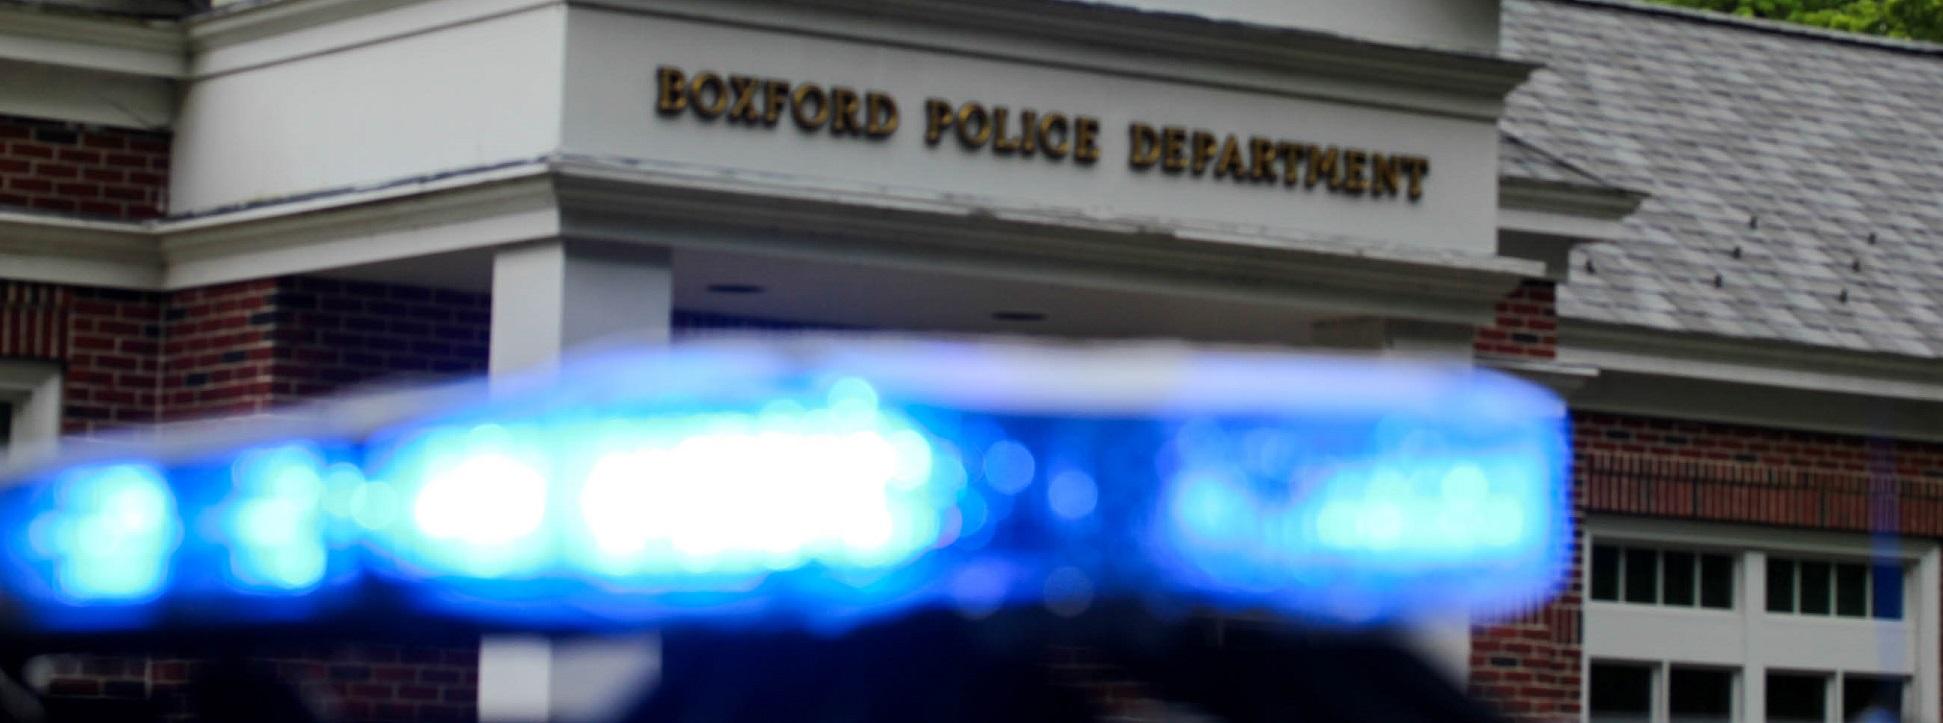 MyPD Police Phone App